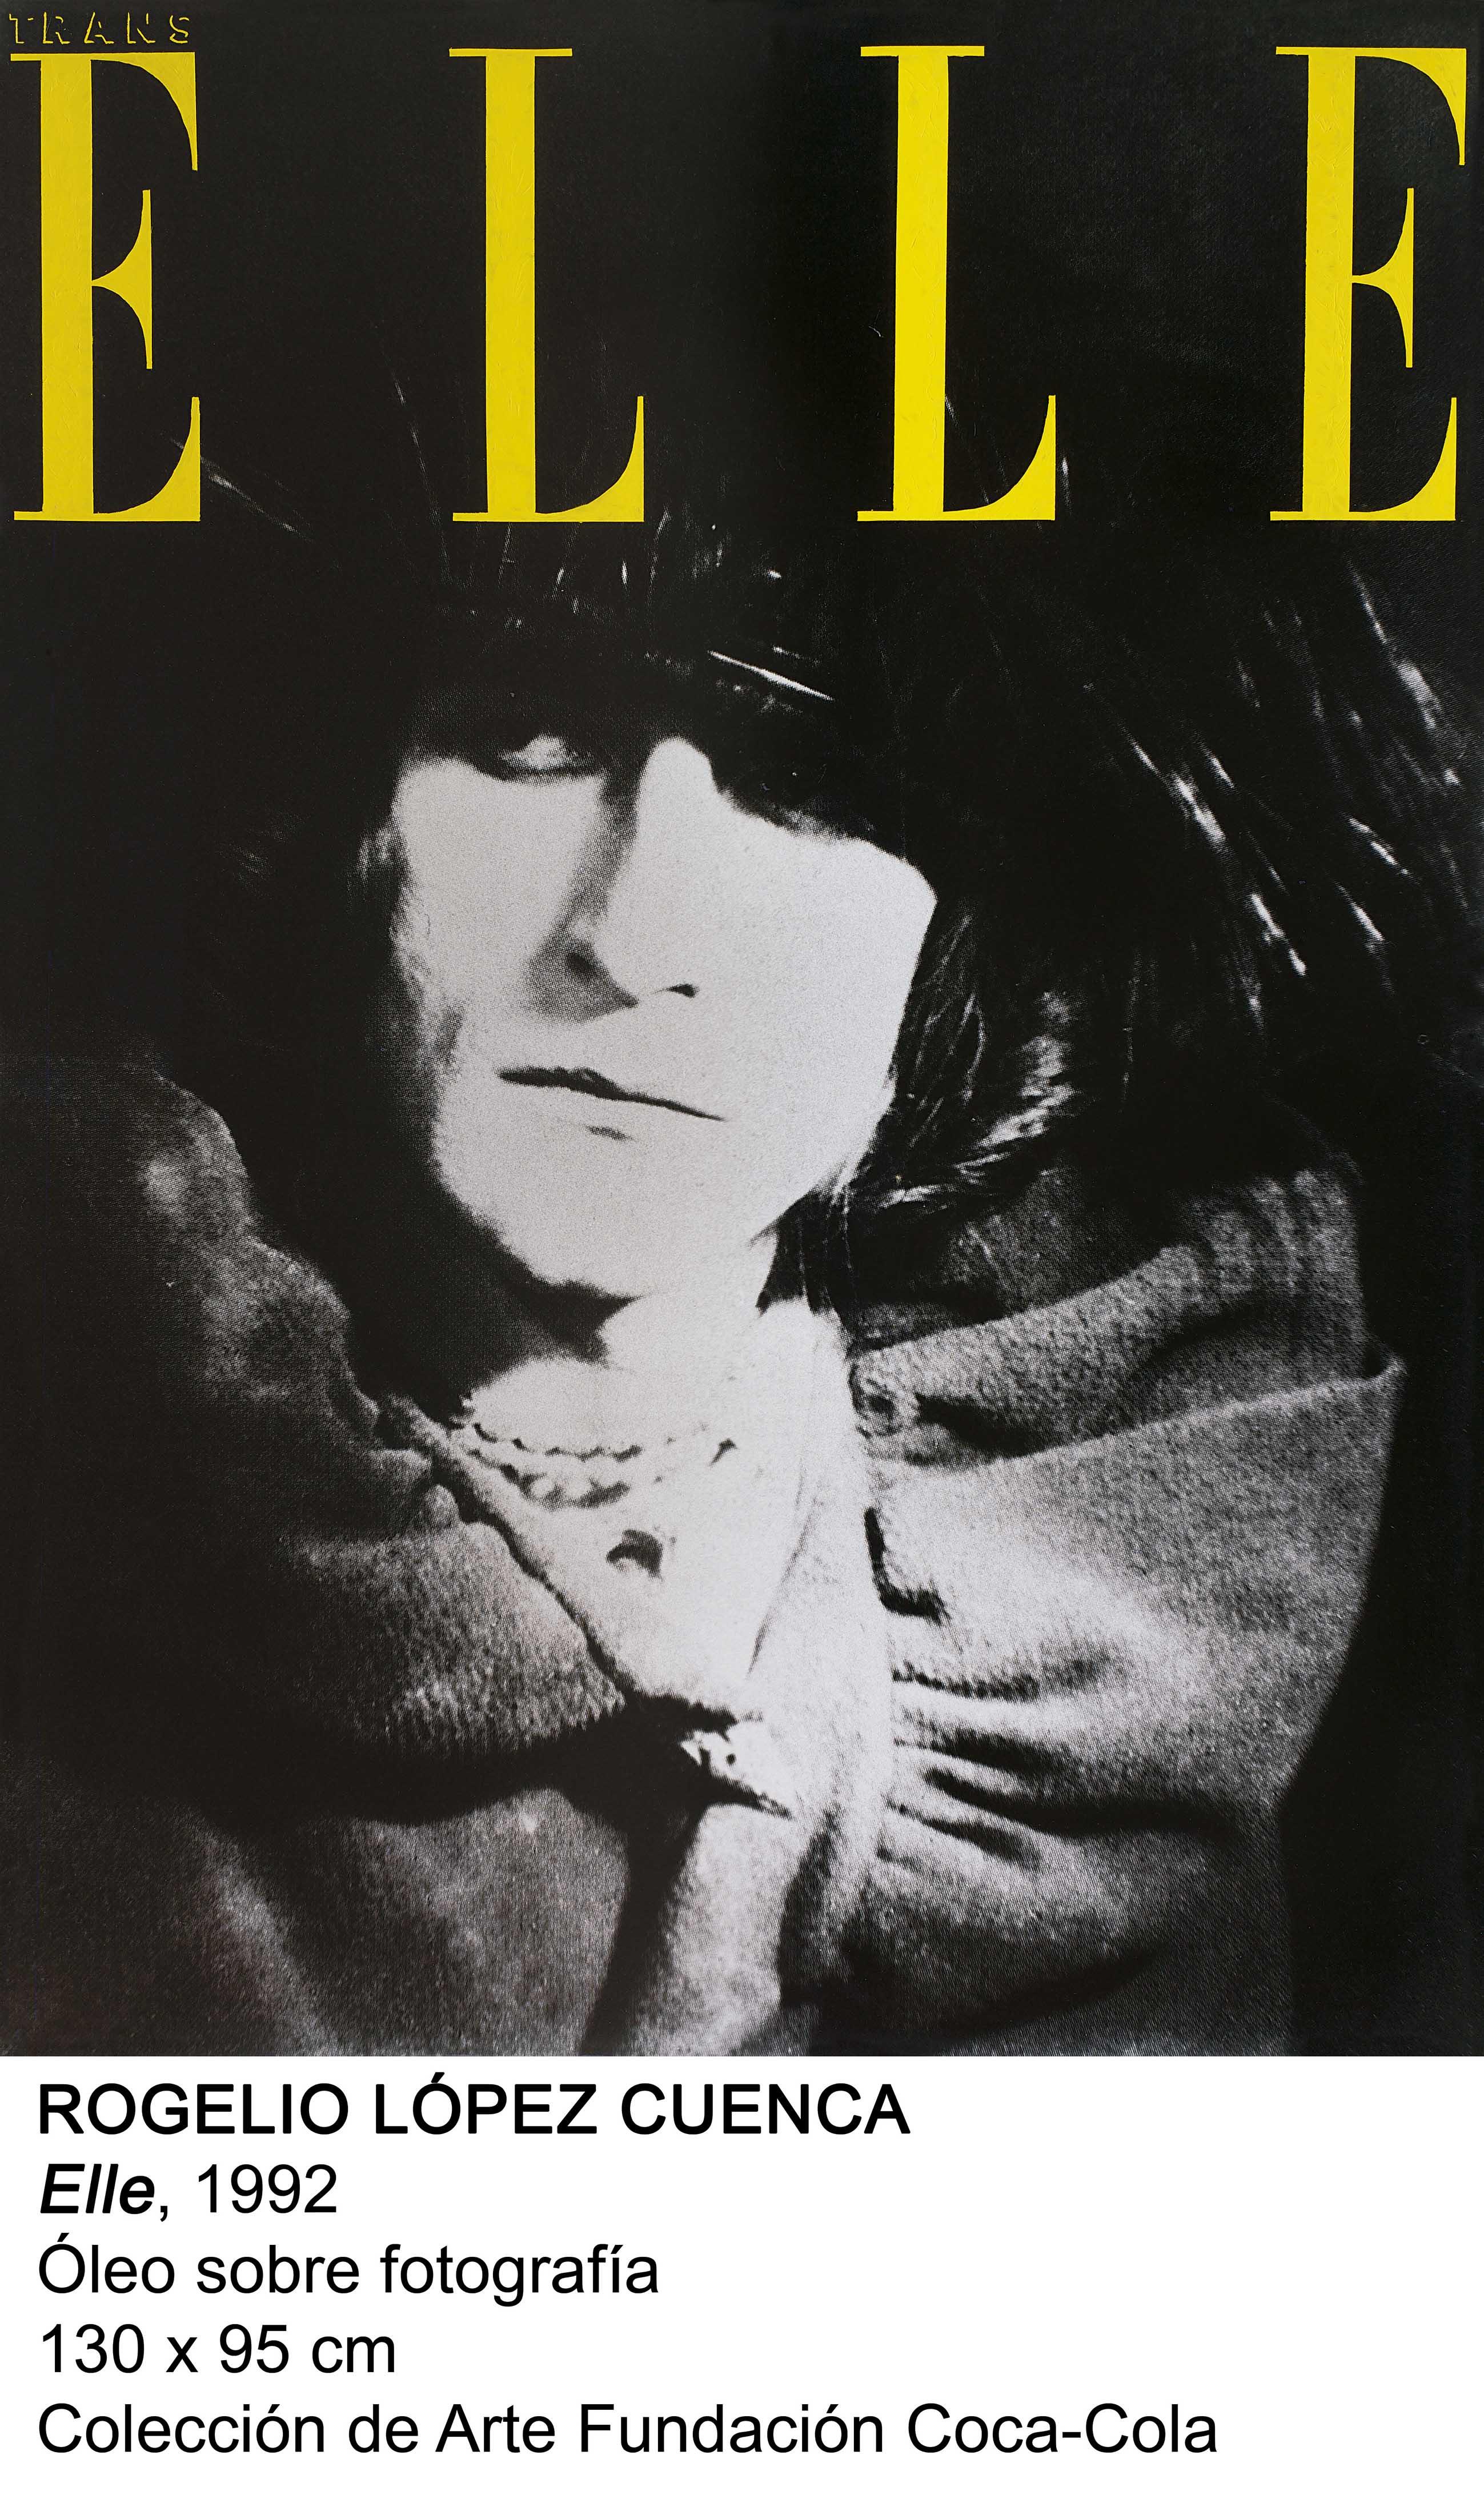 Elle (1992) - Rogelio López Cuenca